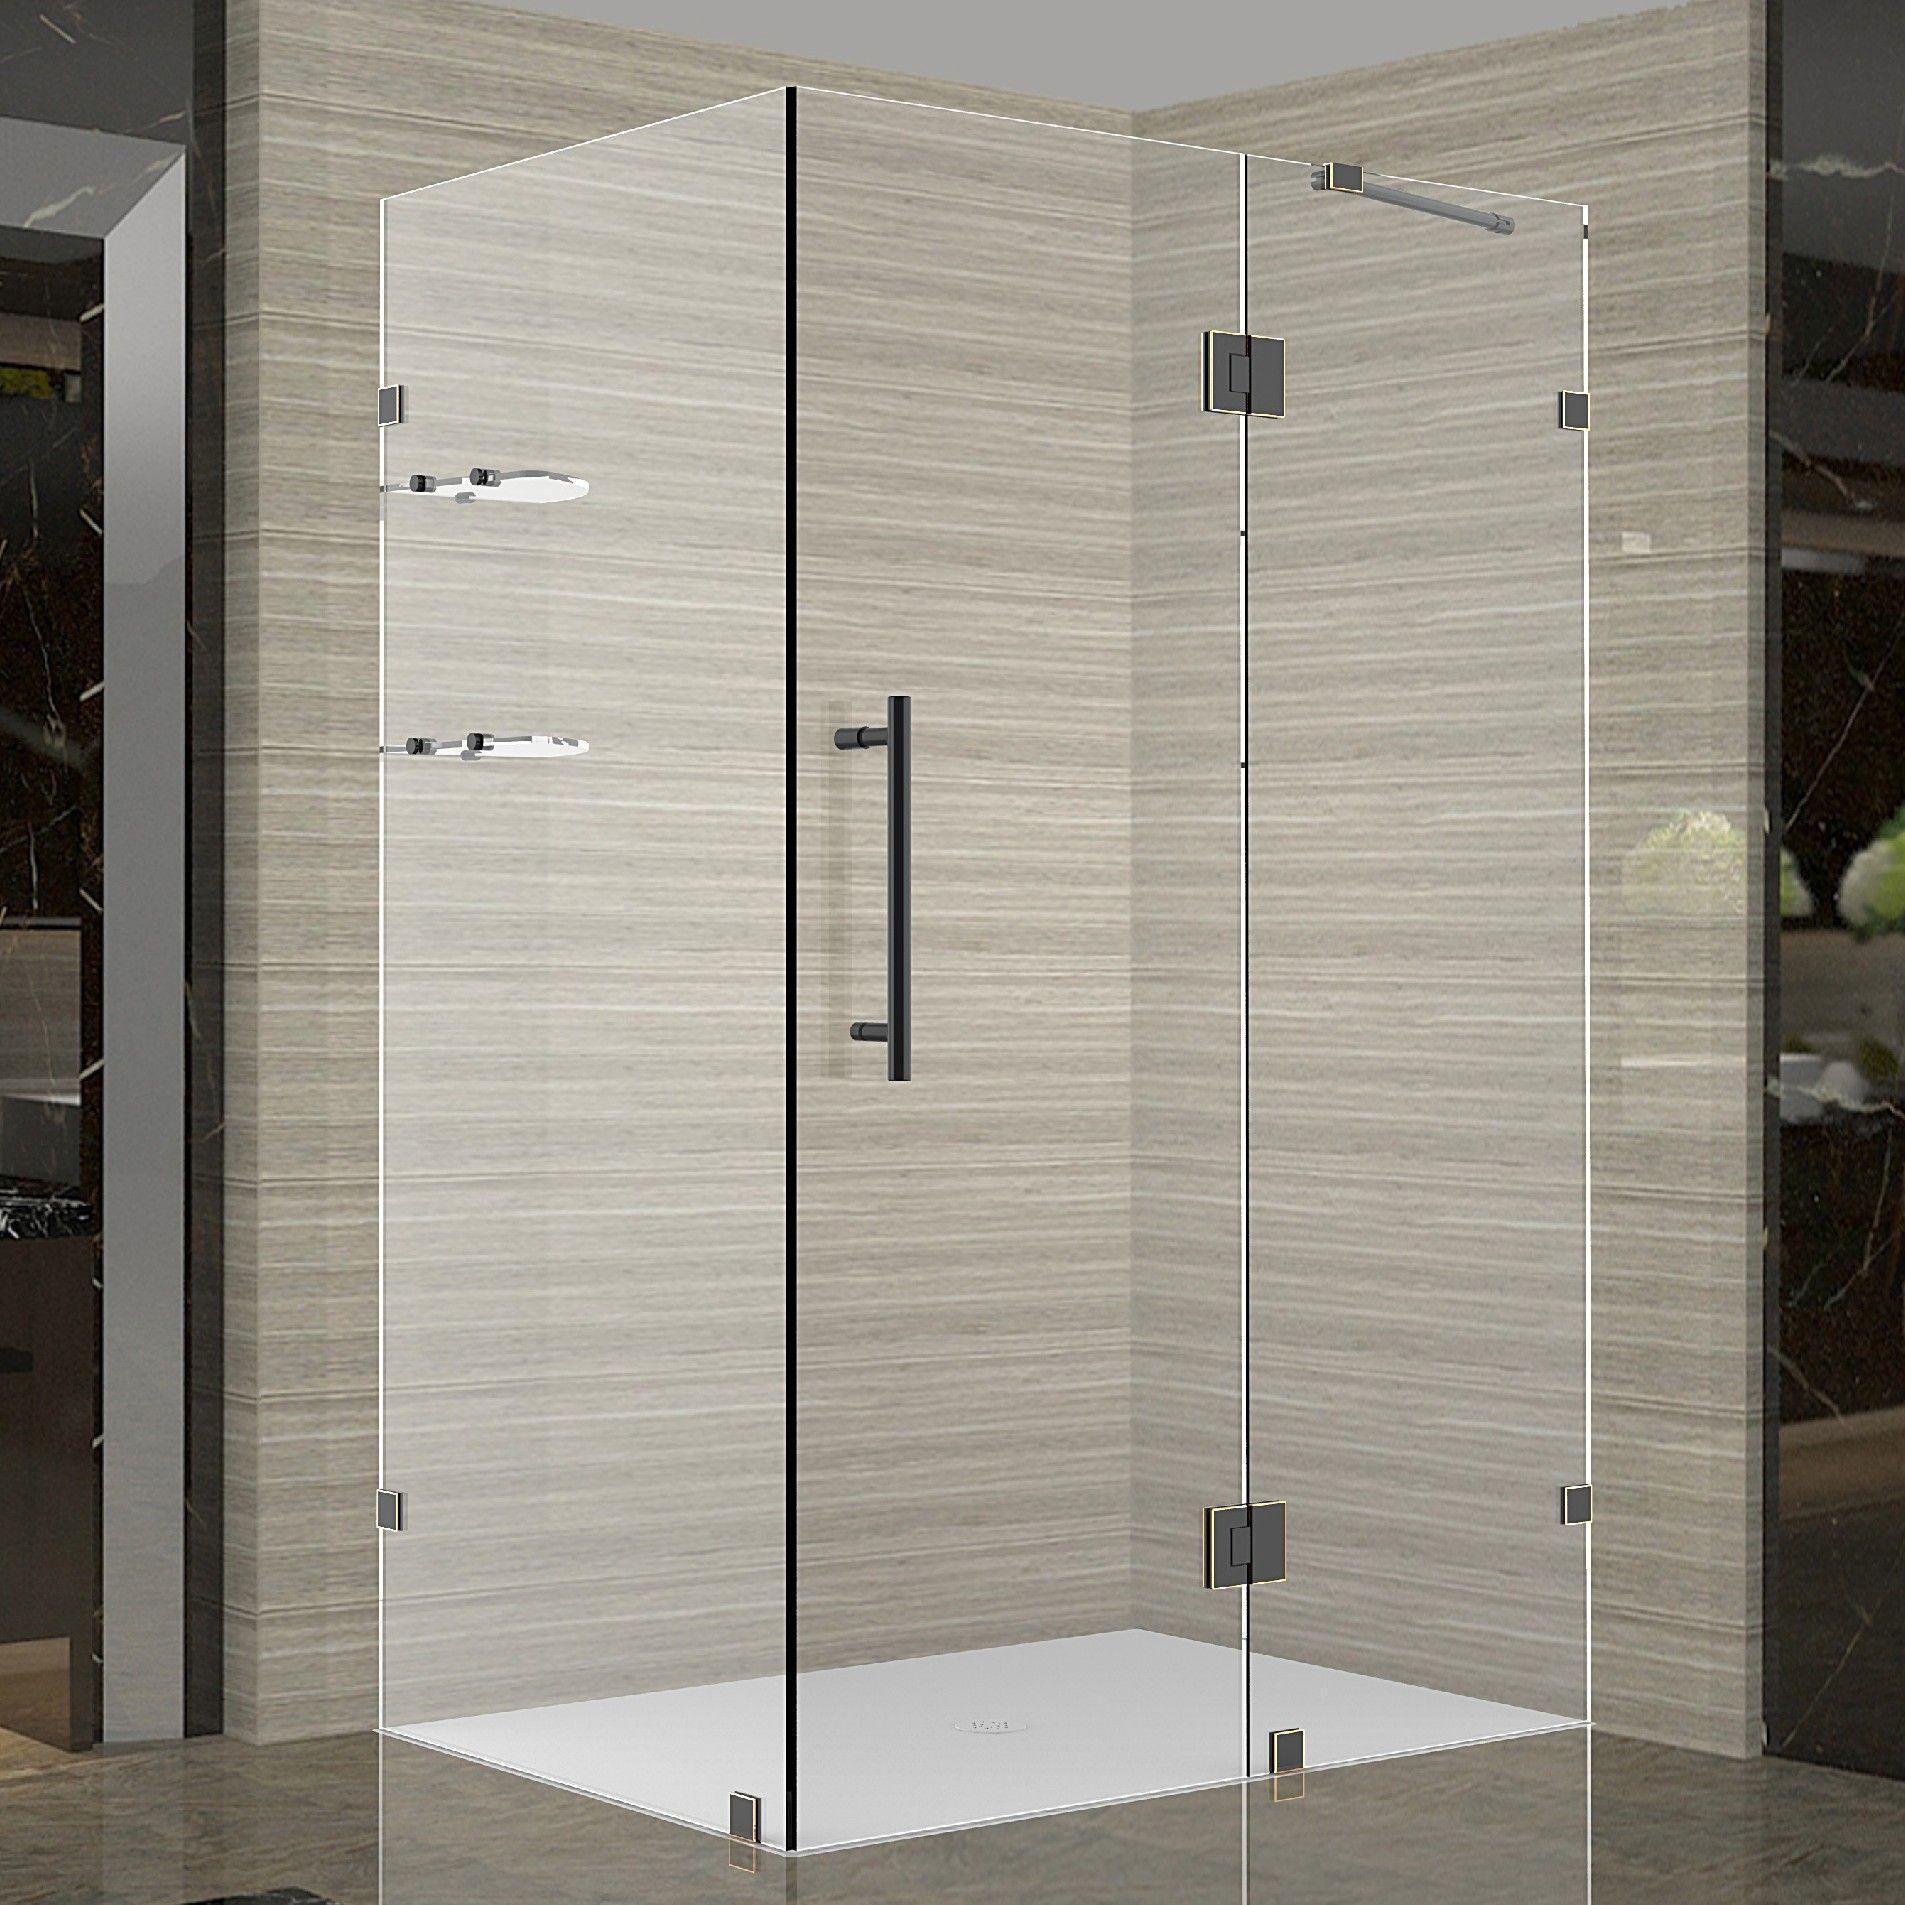 Avalux Gs 34 X 33 X 72 Pivot Door Frameless Shower Enclosure